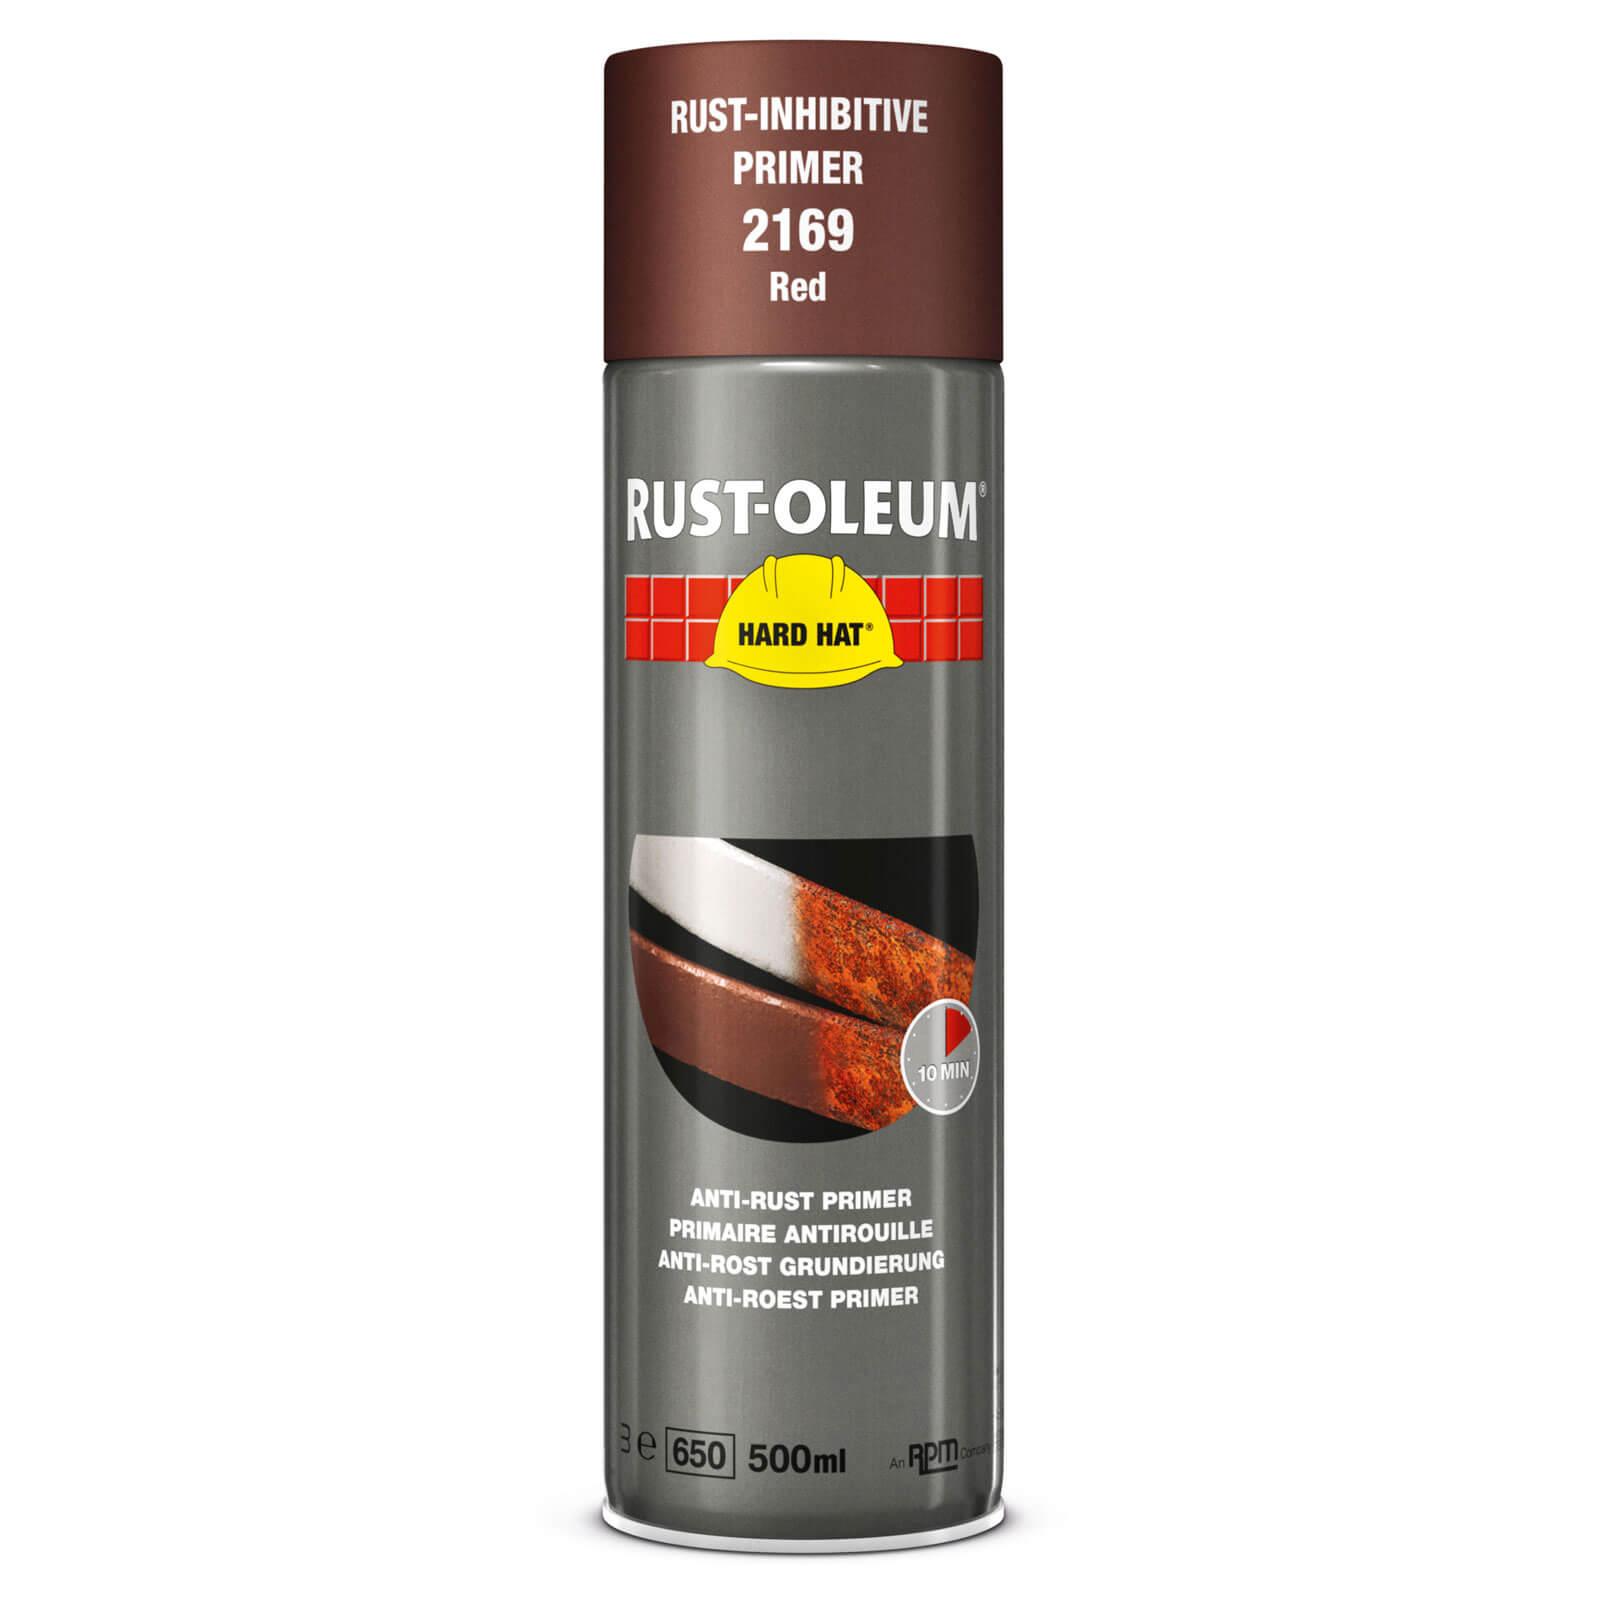 Rust Oleum Hard Hat Metal Primer Spray Paint Red 500ml